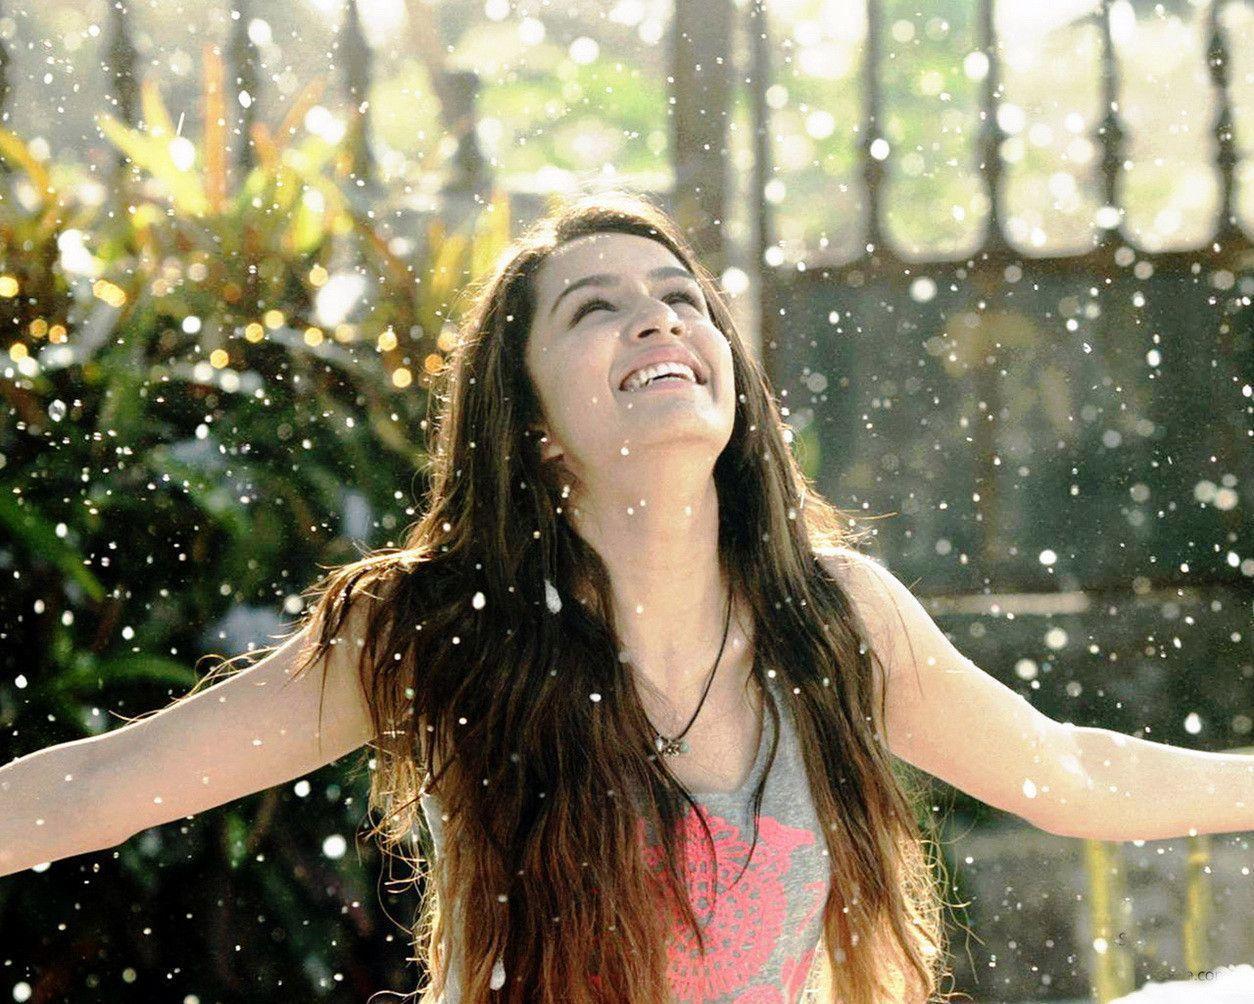 Shraddha Kapoor Bhatt HD Wallpapers 1080p 2015